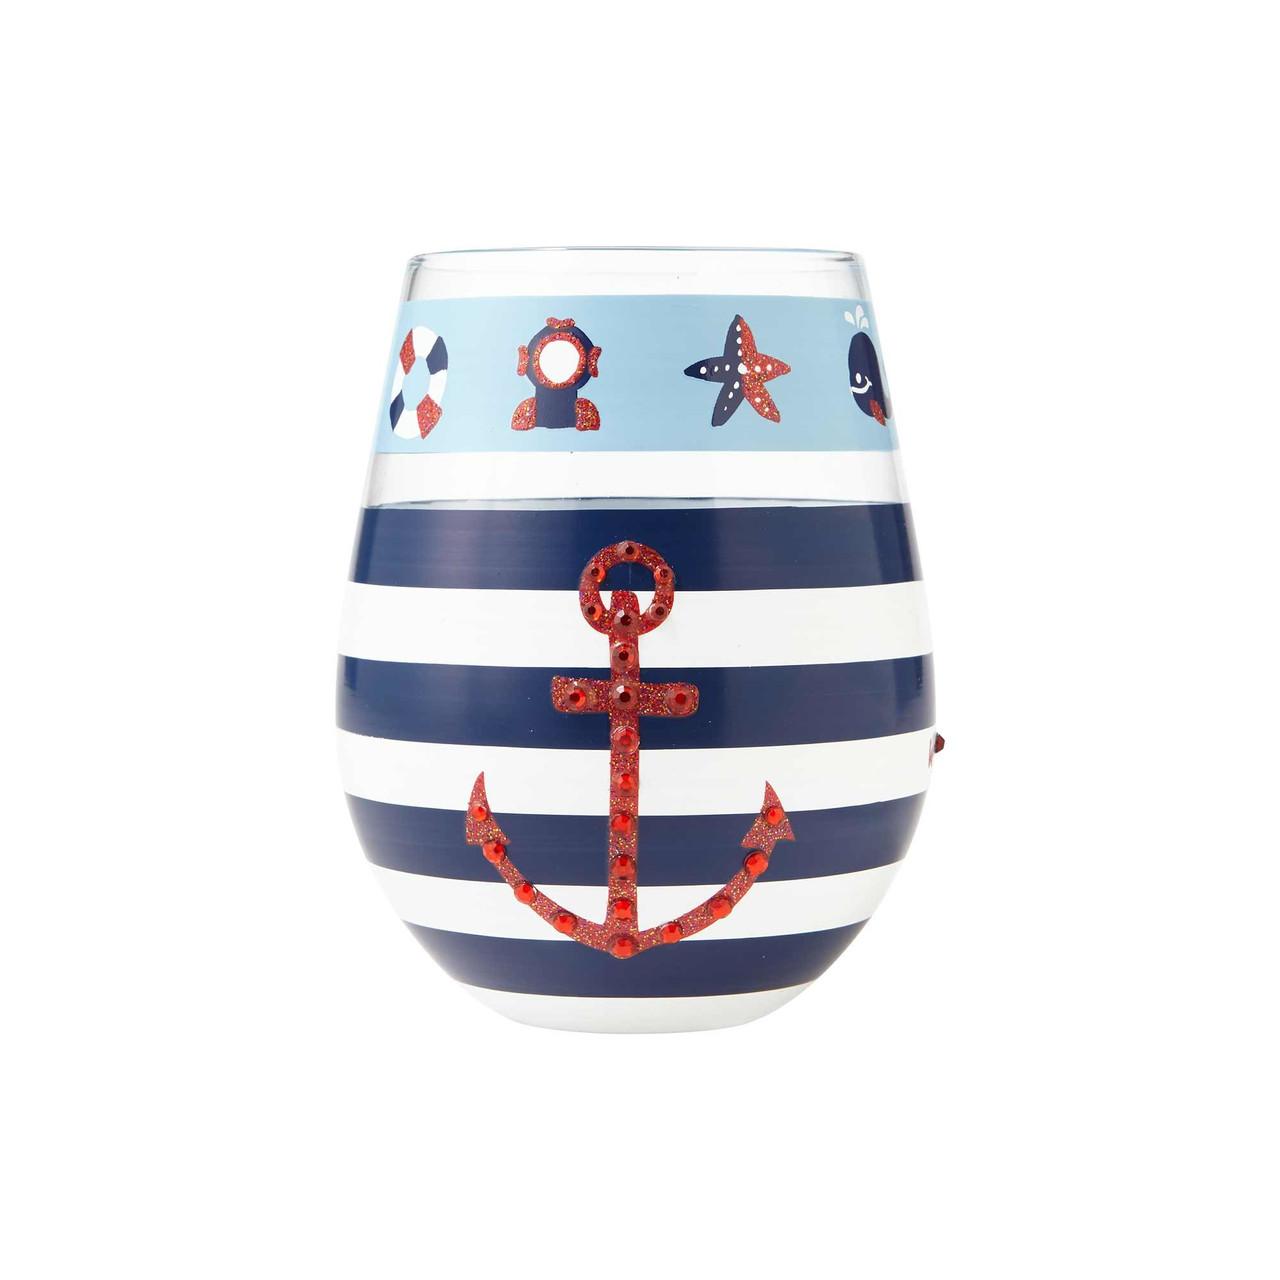 Maritime Nautical Hand Painted 20oz Stemless Wine Glass - 6001312